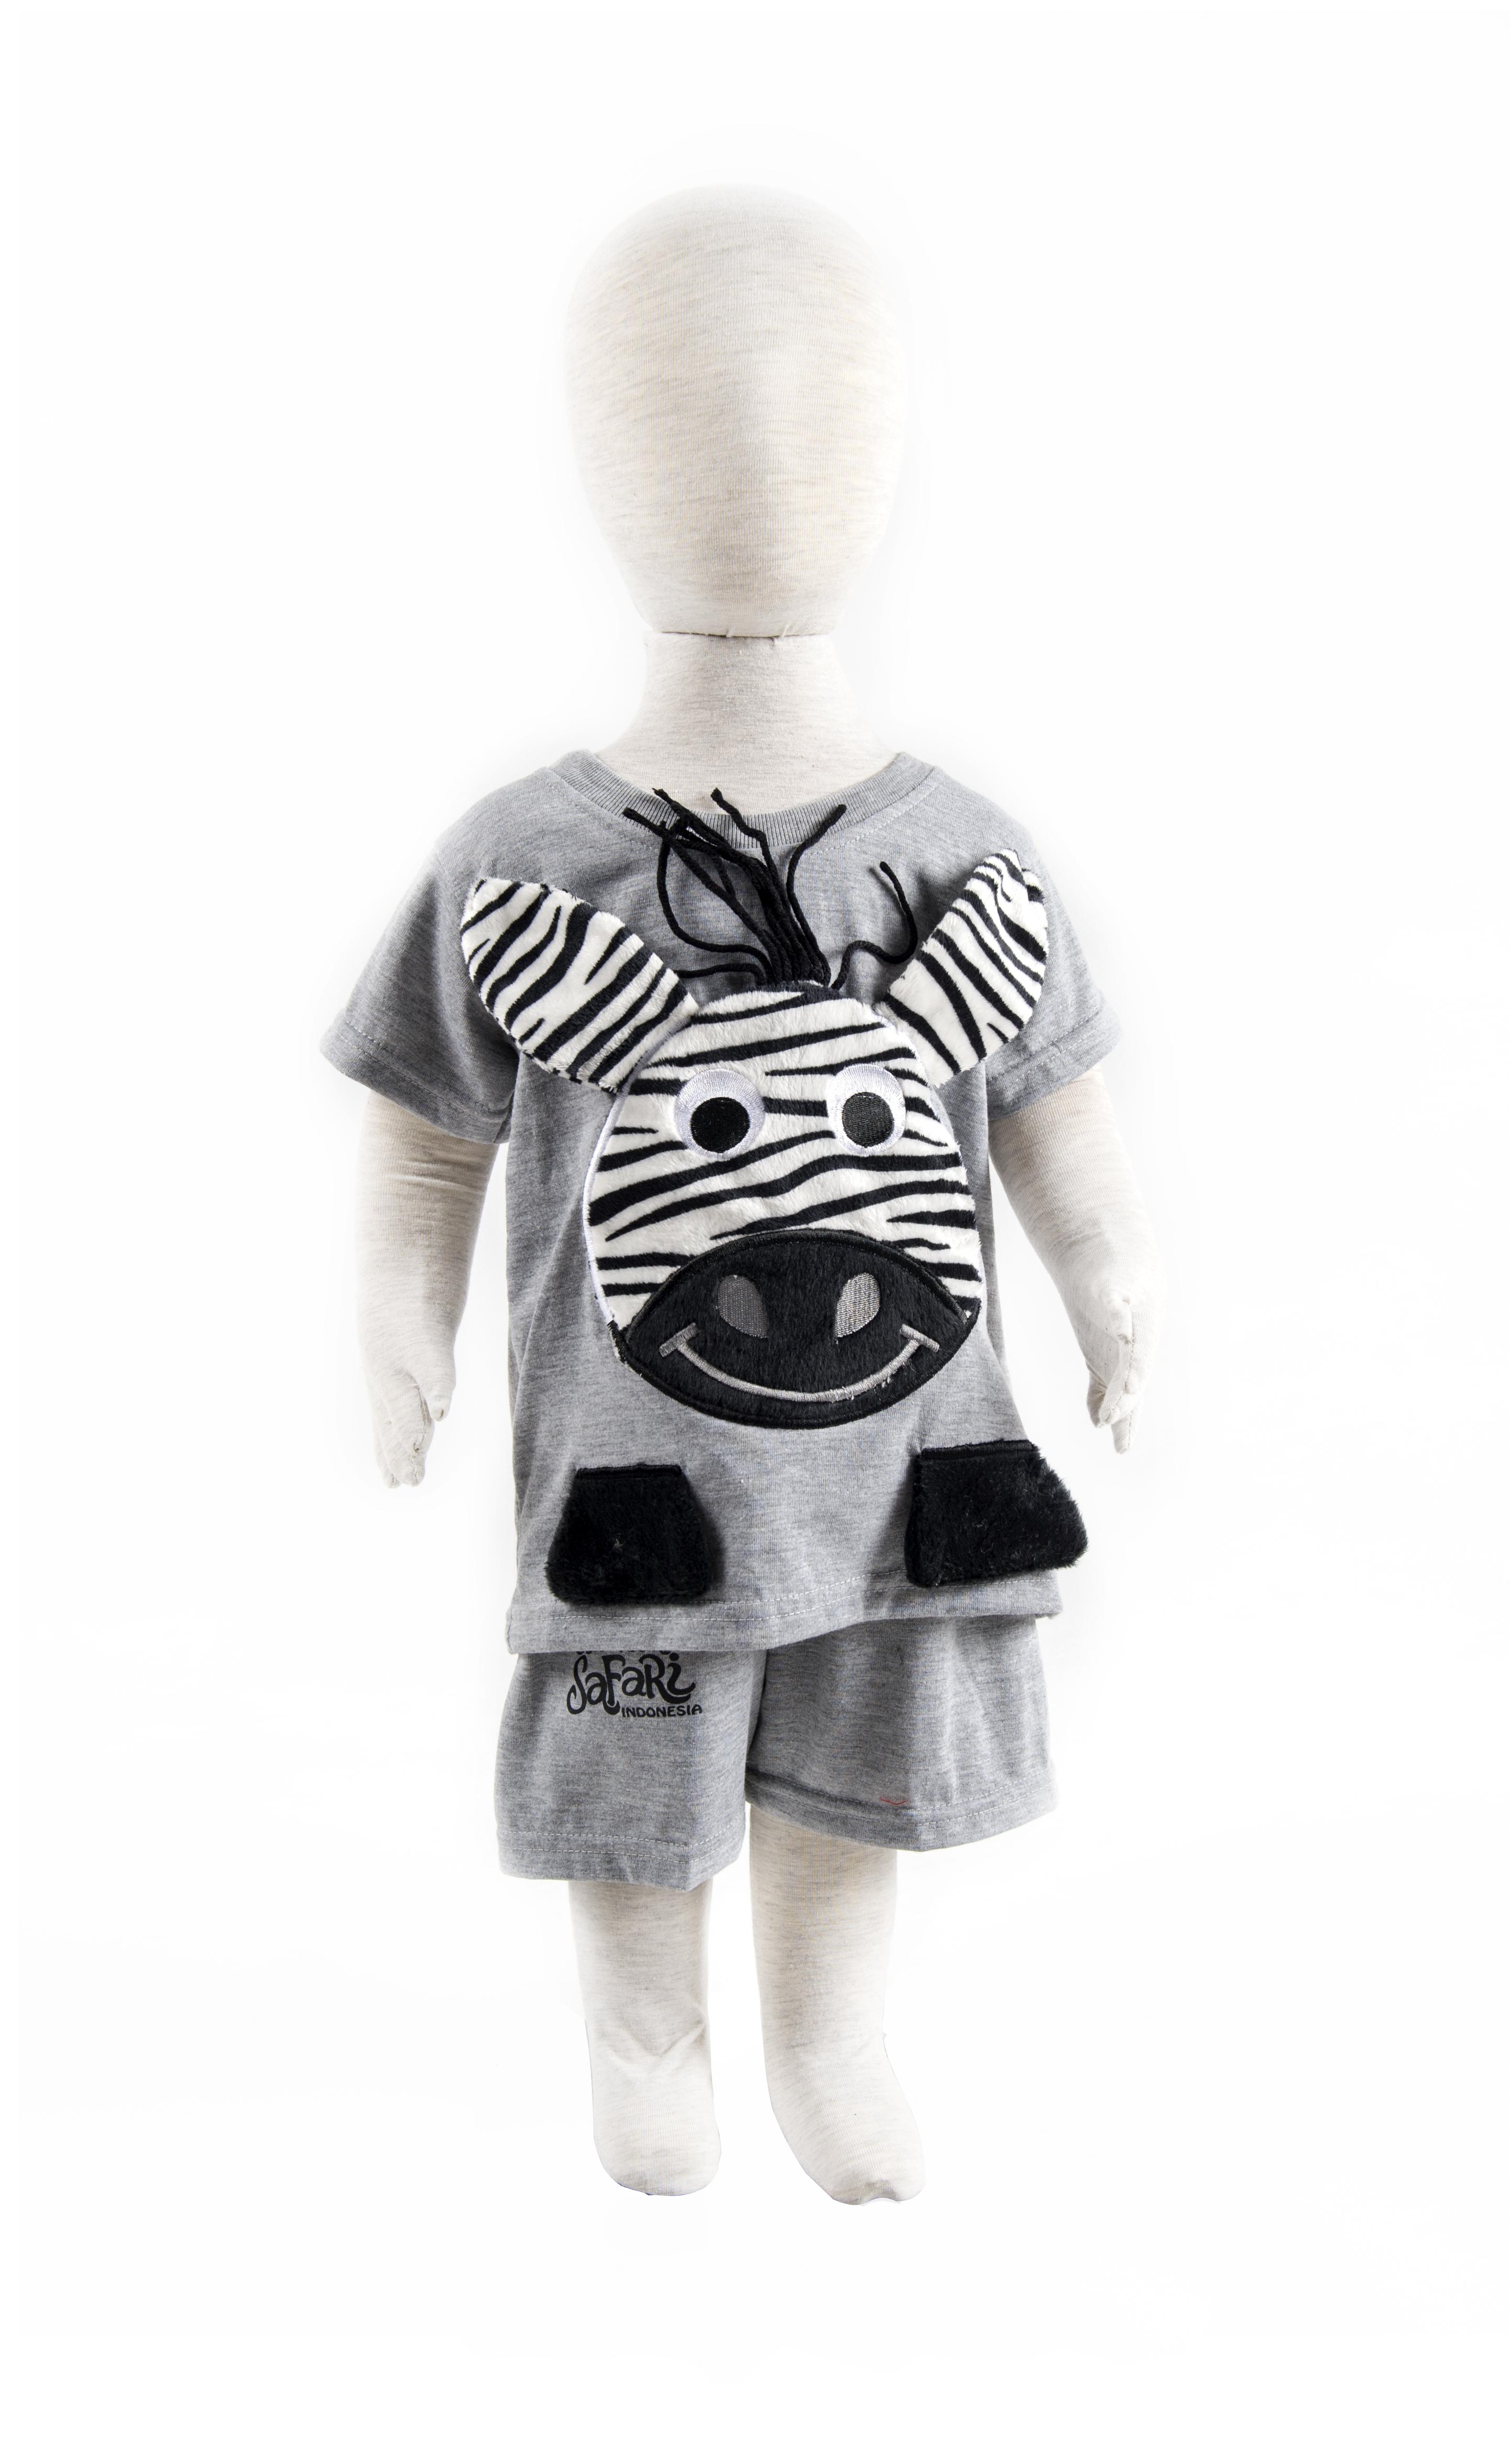 Toddler Zebra Clothing Set in Misty Grey 2T